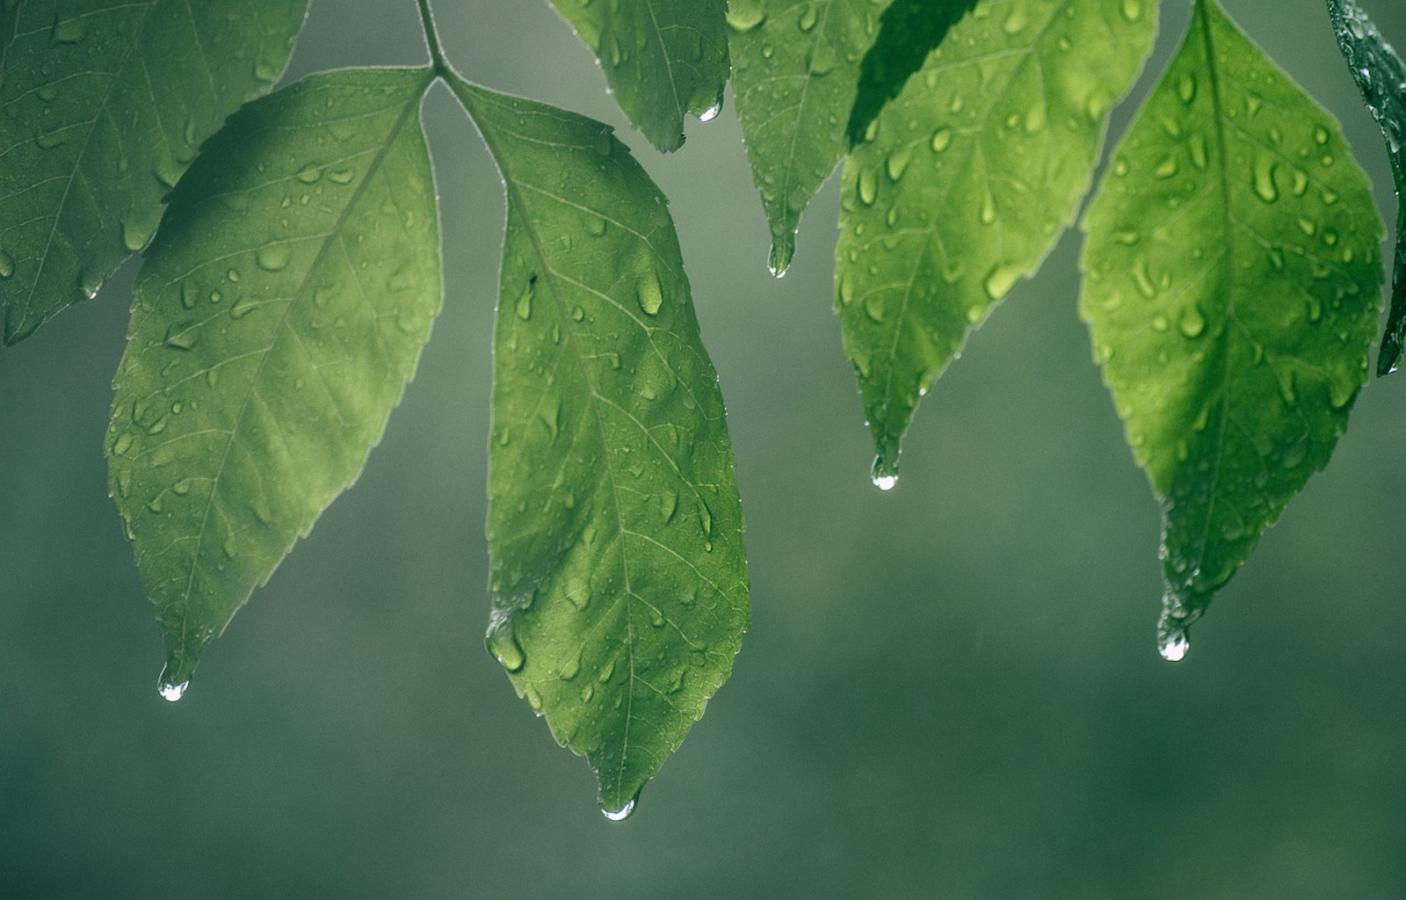 Tefillat Geshem: The Prayer for Rain | My Jewish Learning